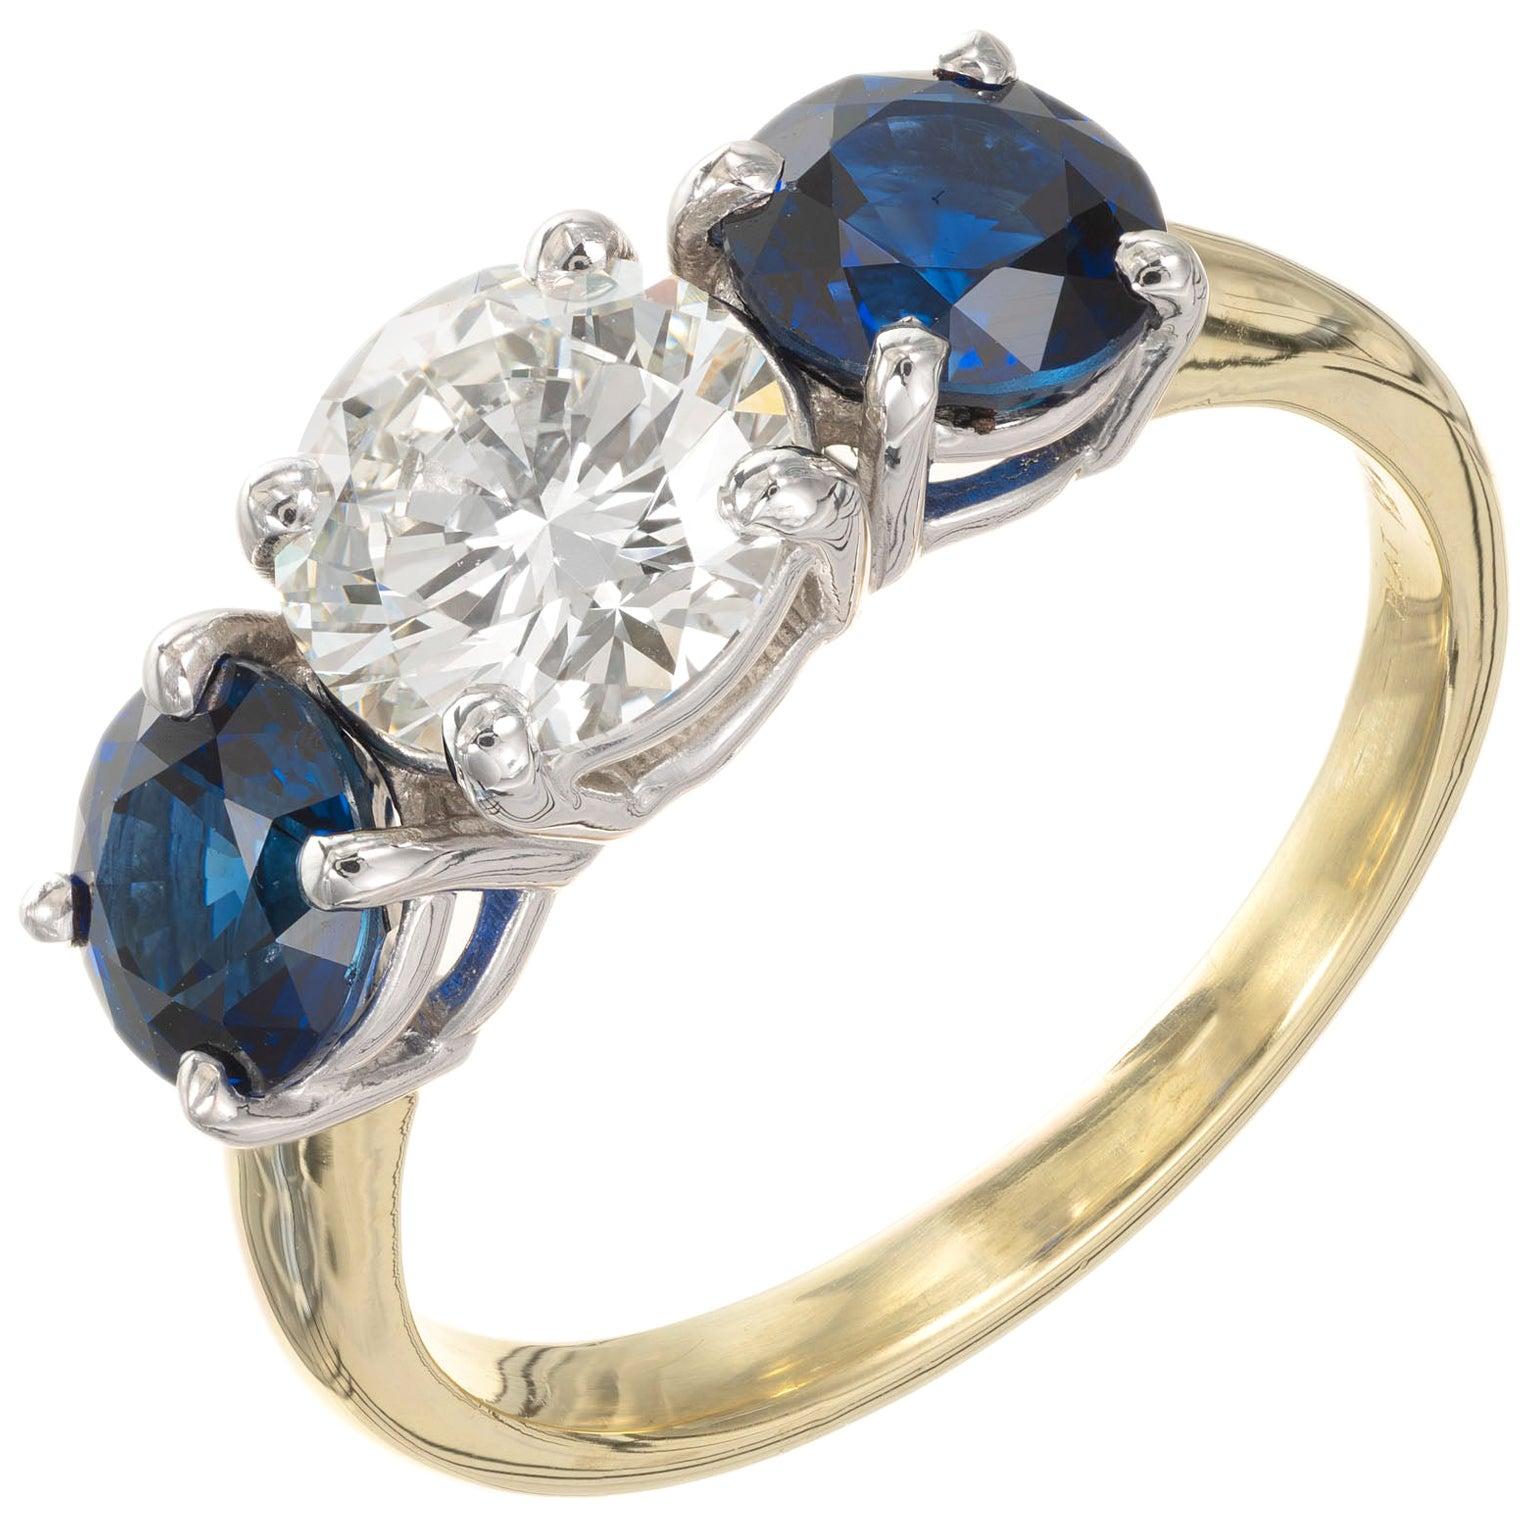 Peter Suchy GIA 3.31 Carat Diamond Sapphire Gold Platinum Engagement Ring